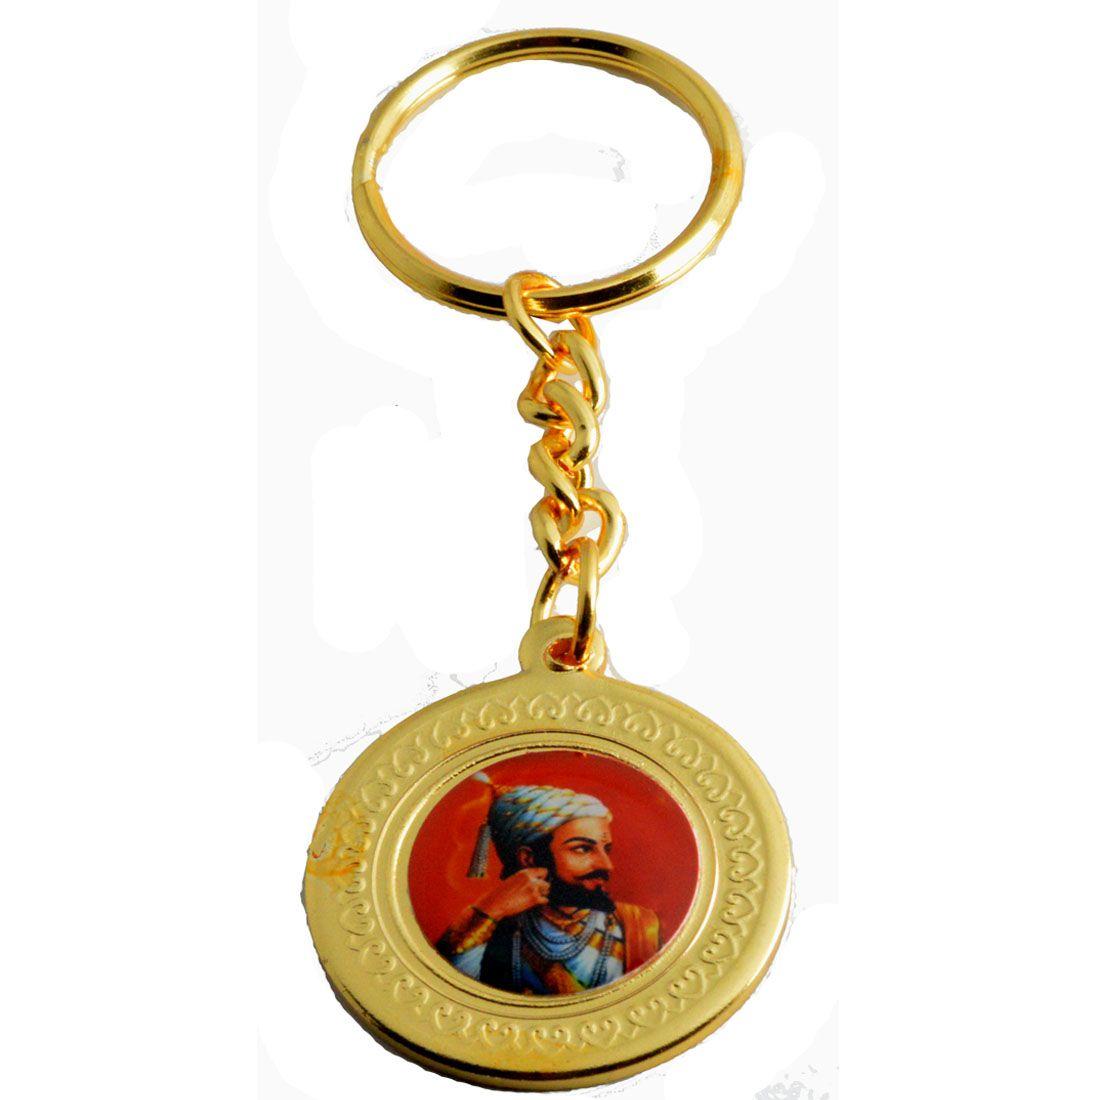 Faynci Honor and Proud of every Indian Raje Shivaji Maharaj with Rajmudra Key Chain for Gifting